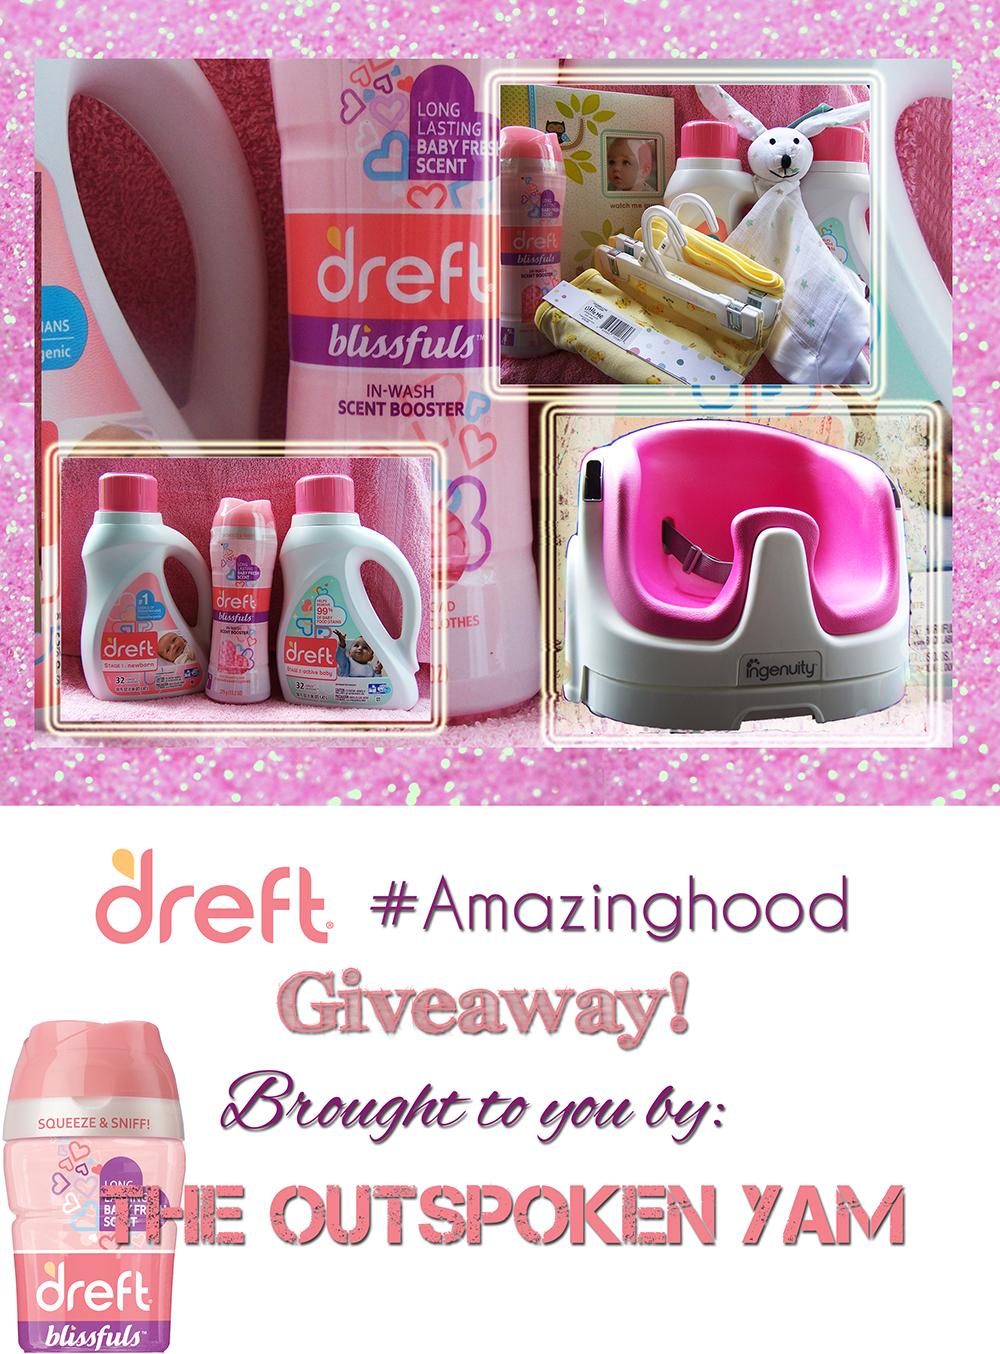 Dreft  #Amazinghood & An Awesome Giveaway! $165 ARV. Ends 5/16 #DDDivas  #sponsored